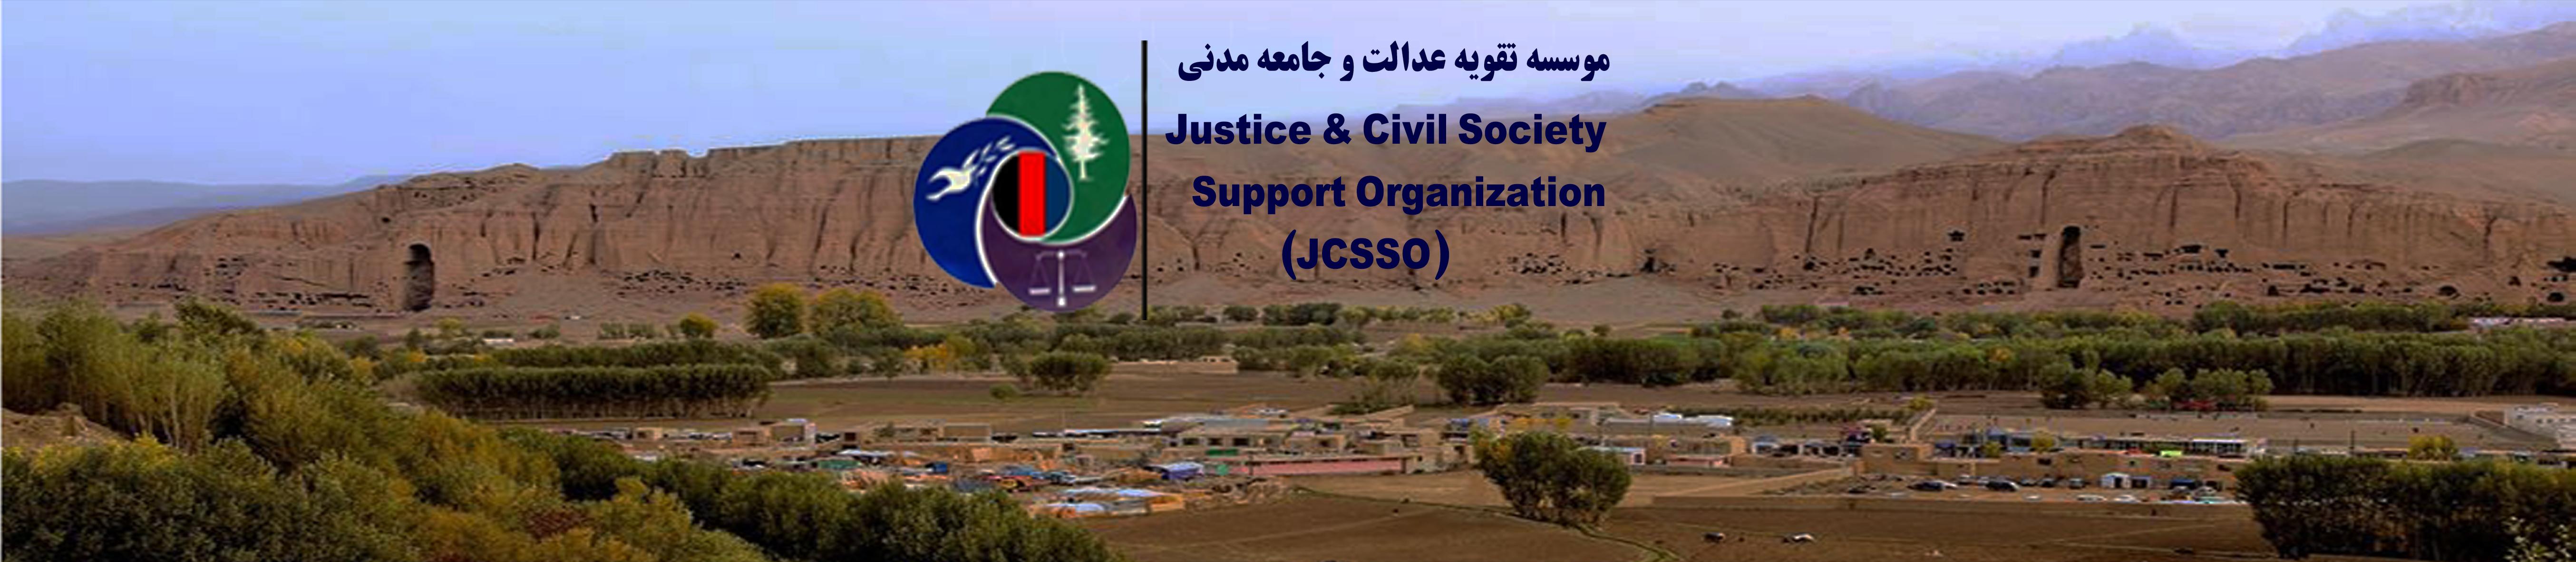 Justice & Civil Society Support Organization